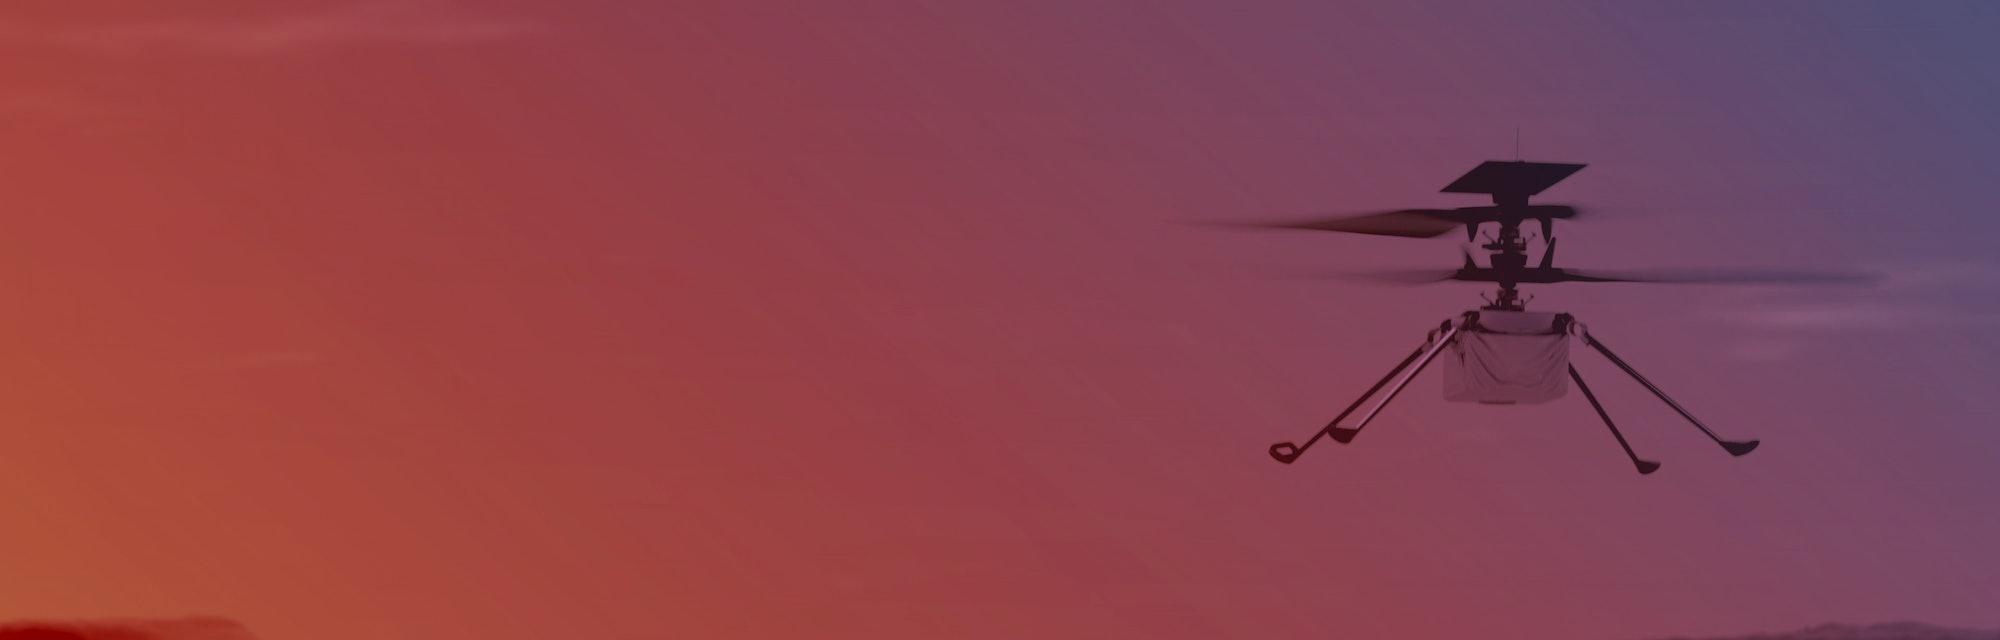 An illustration of NASA's Ingenuity Helicopter flying on Mars